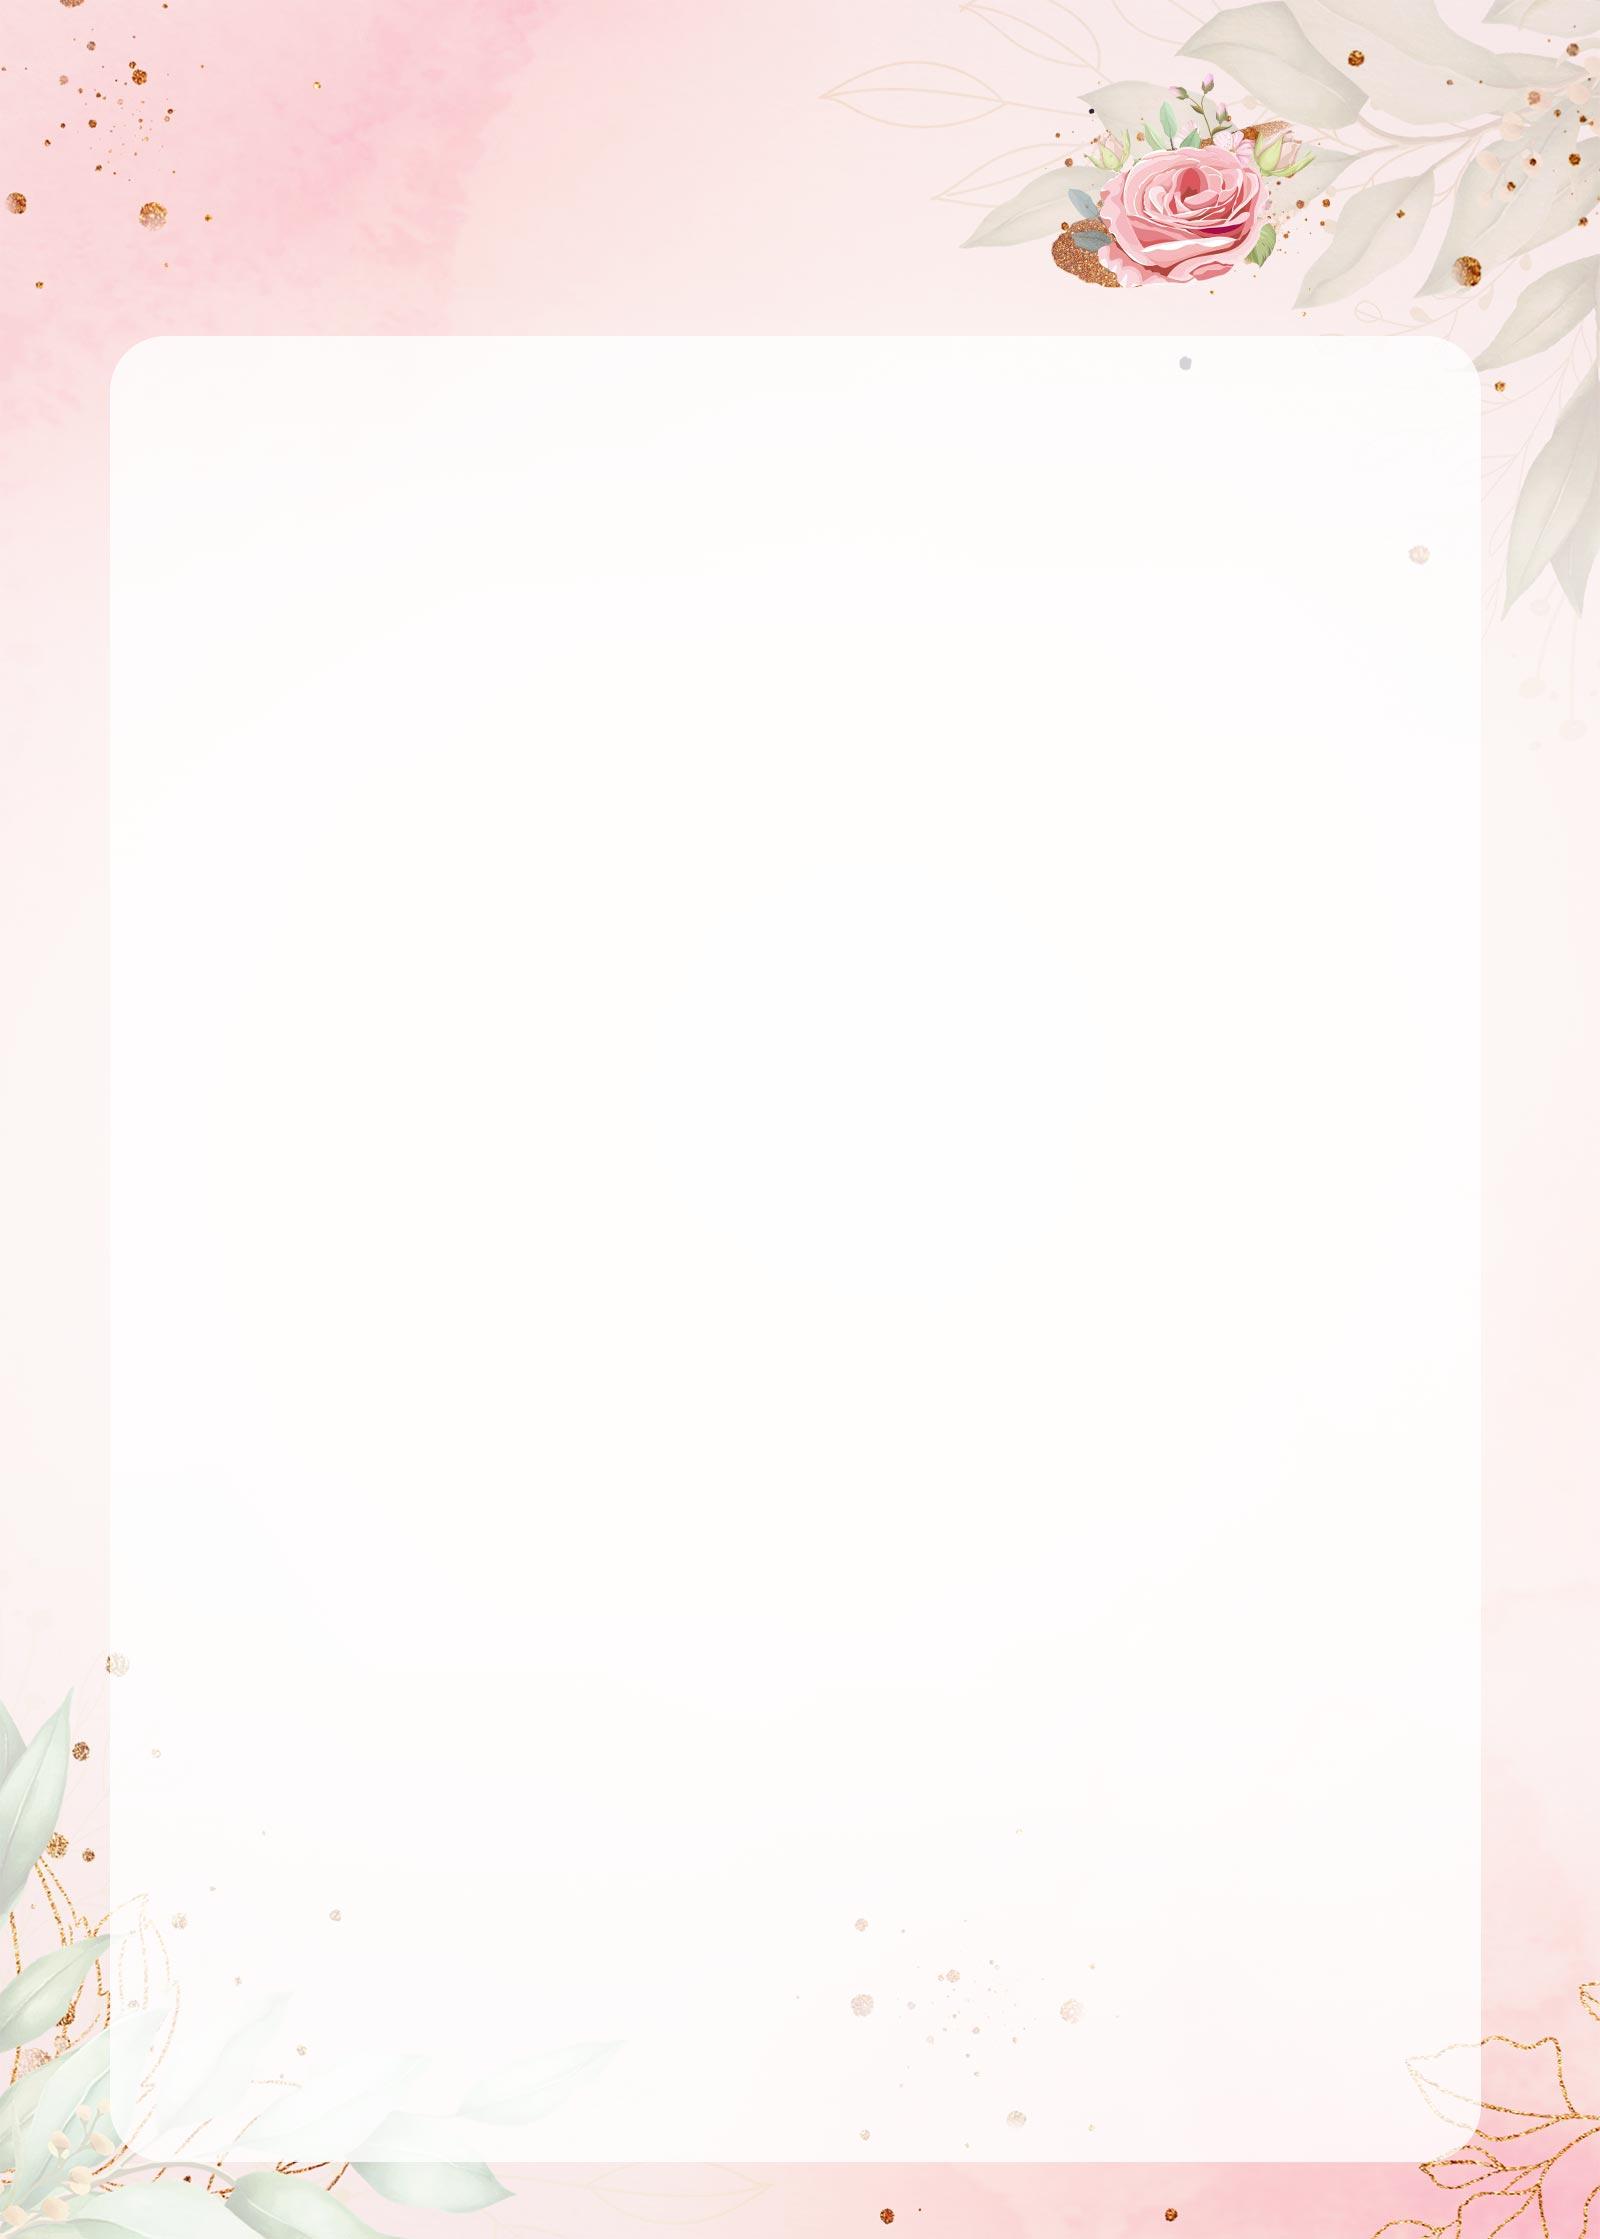 Planner 2021 Floral com Inicial Molde em Branco